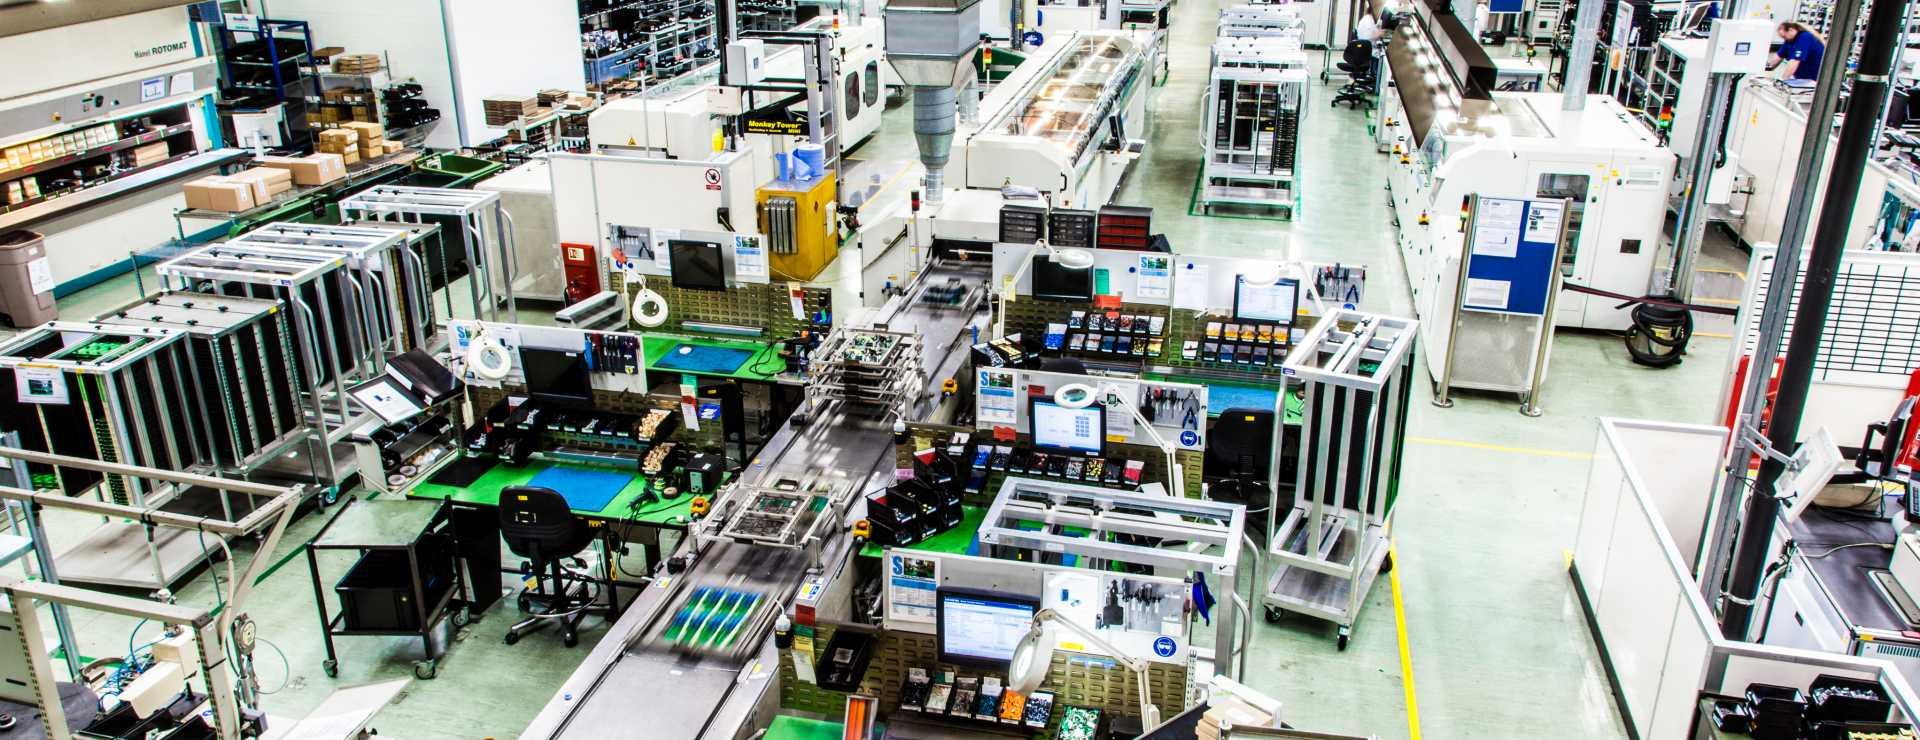 Factory Floor Congleton - image courtesy of Siemens.